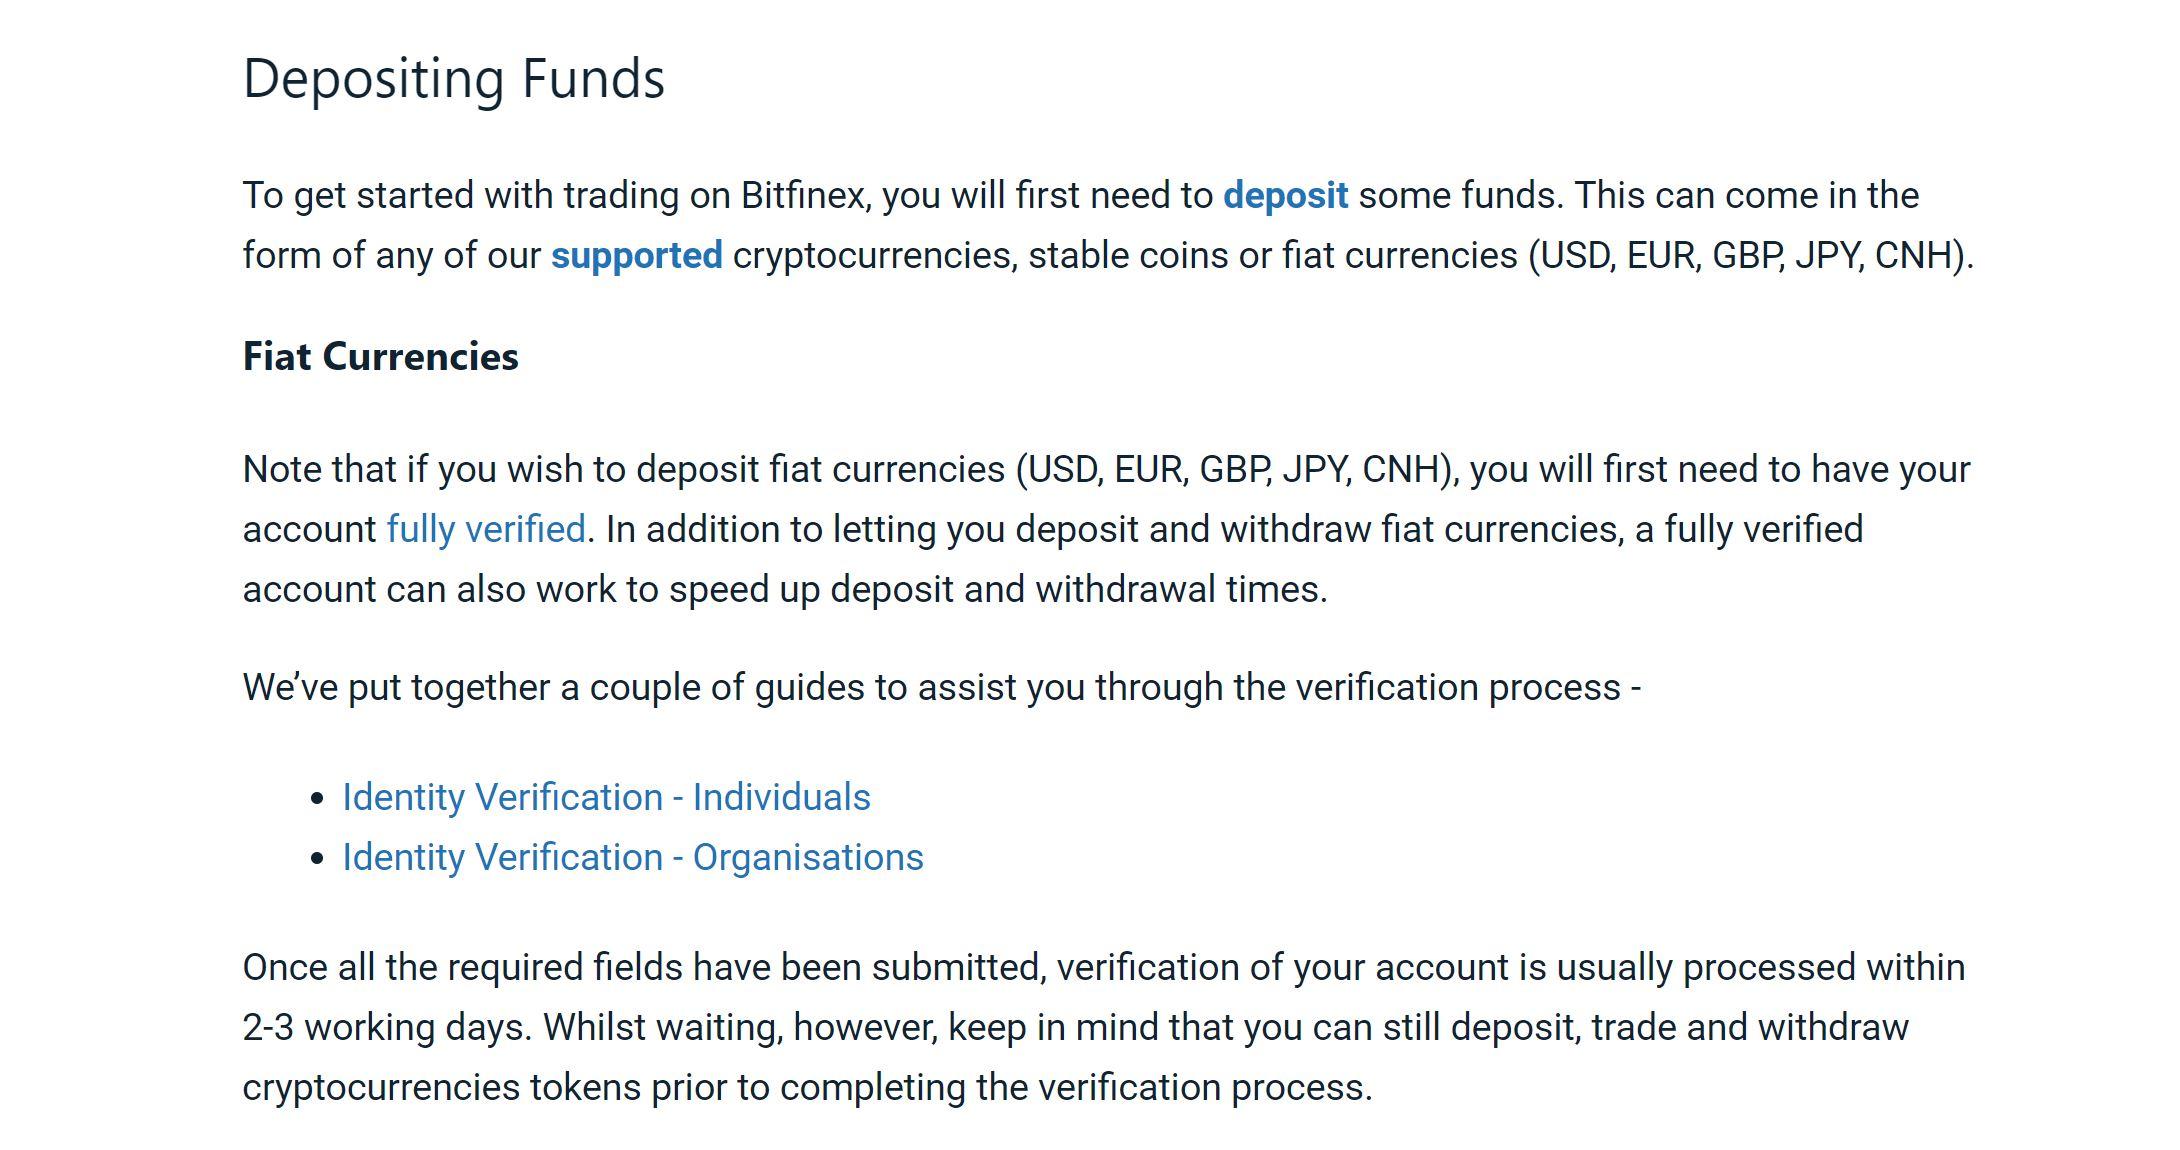 Deposit money into Bitfinex account